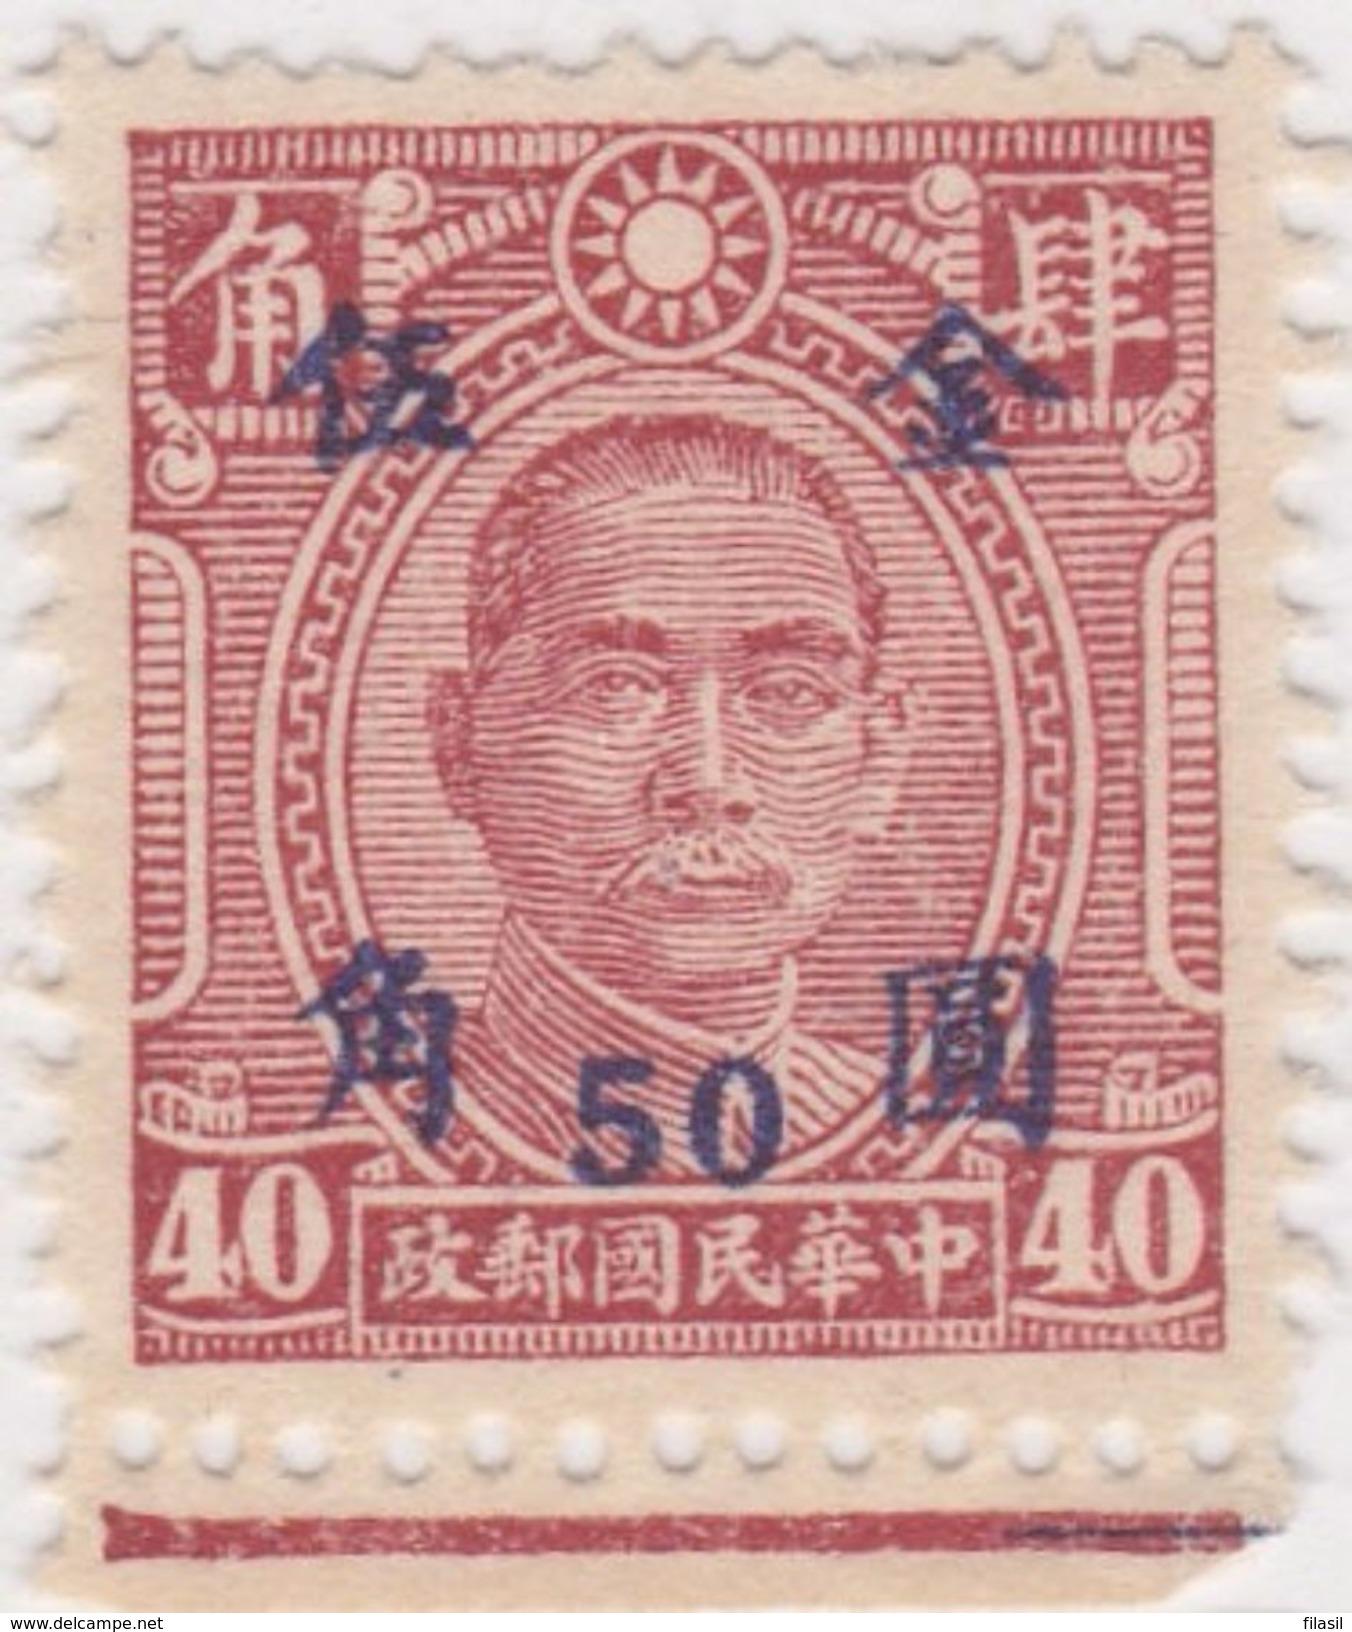 SI53D Cina China Chine 50/40 Rare Fine  Yuan China Stamp  Surcharge NO Gum - 1941-45 Cina Del Nord